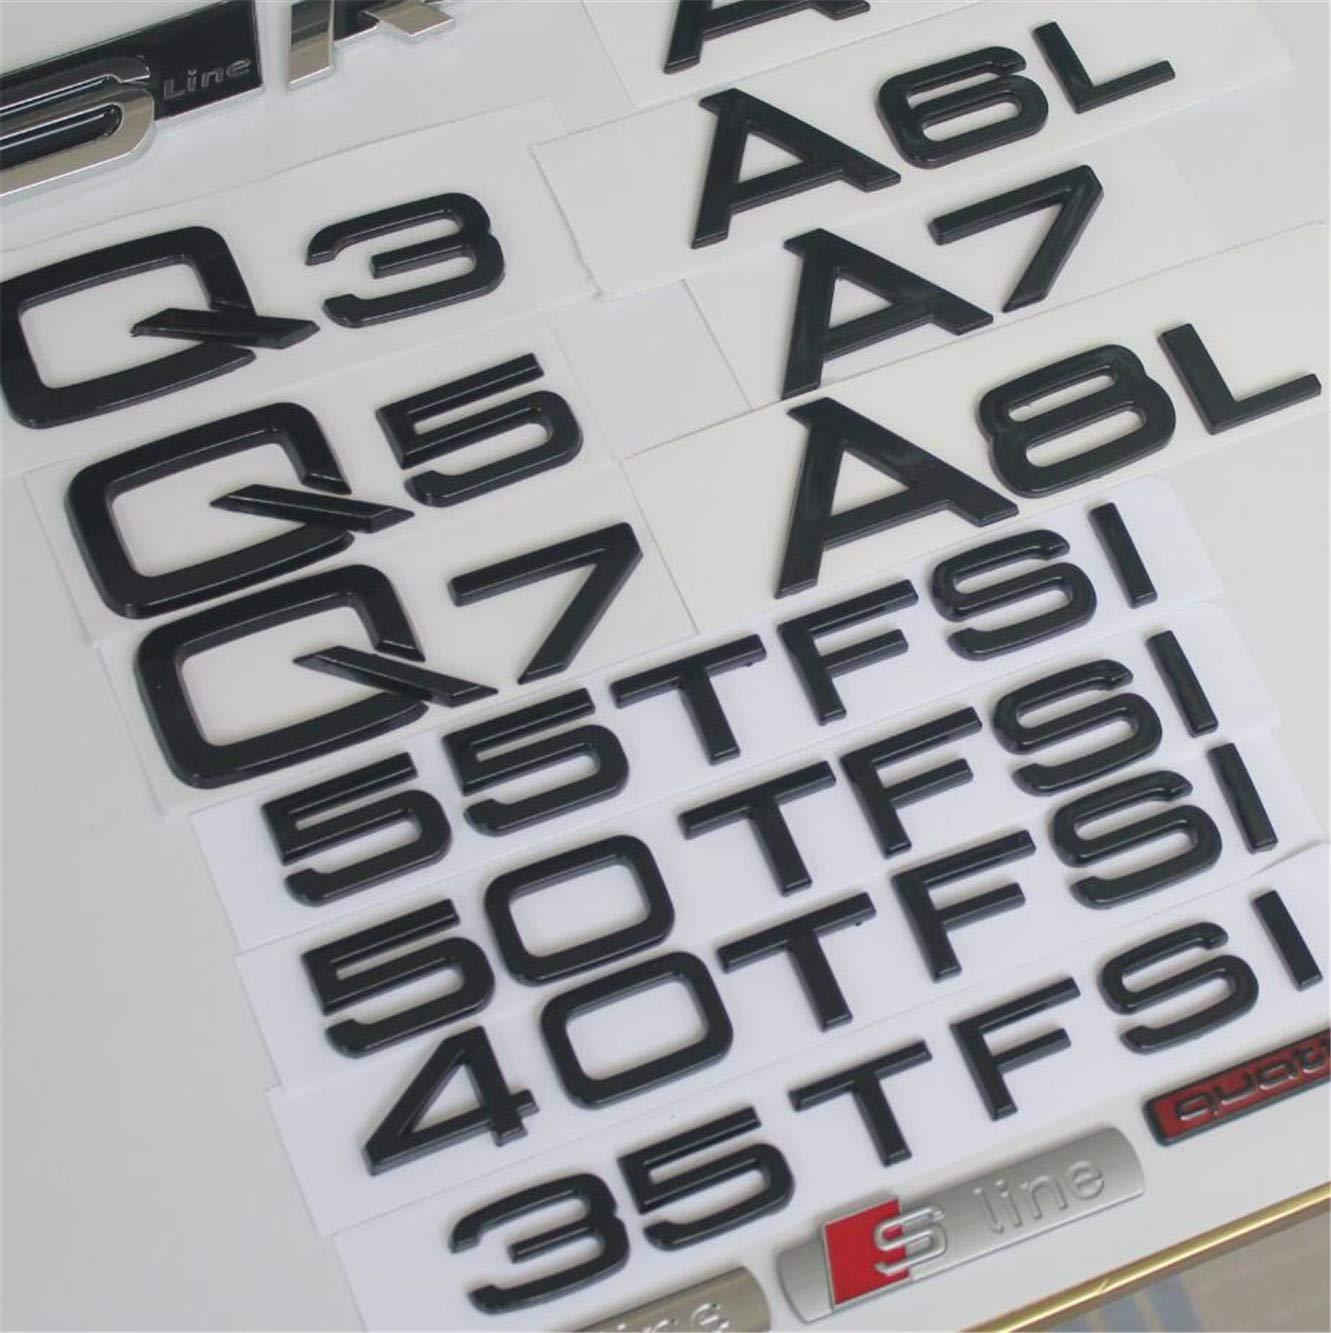 DGF HGF Glossy Black Back Box Letters Badge Emblems A3 A4 A5 A6 A7 A8 A4L A6L A8L Q3 Q5 Q7 35 40 45 50 55 TFSI